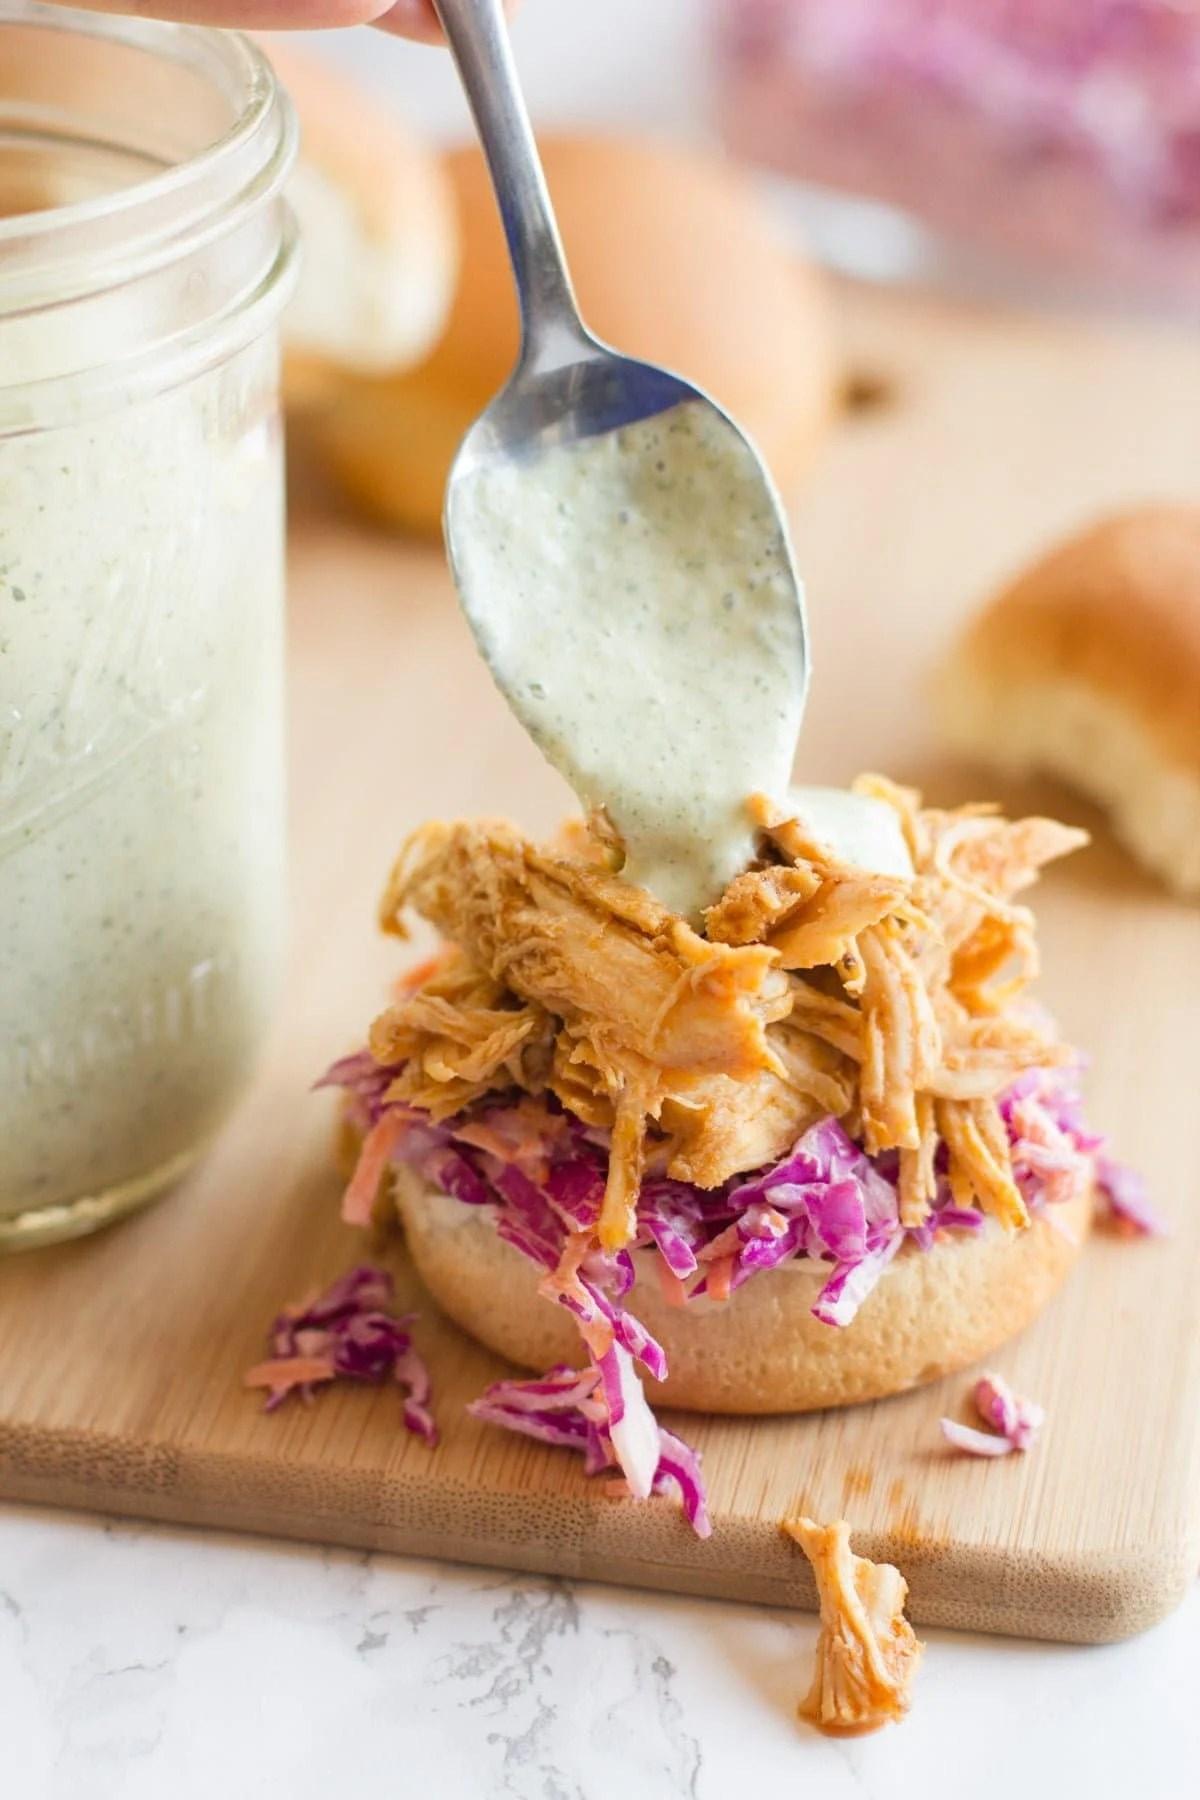 A spoon drizzles greek yogurt ranch sauce onto the top of a sriracha chicken slider.